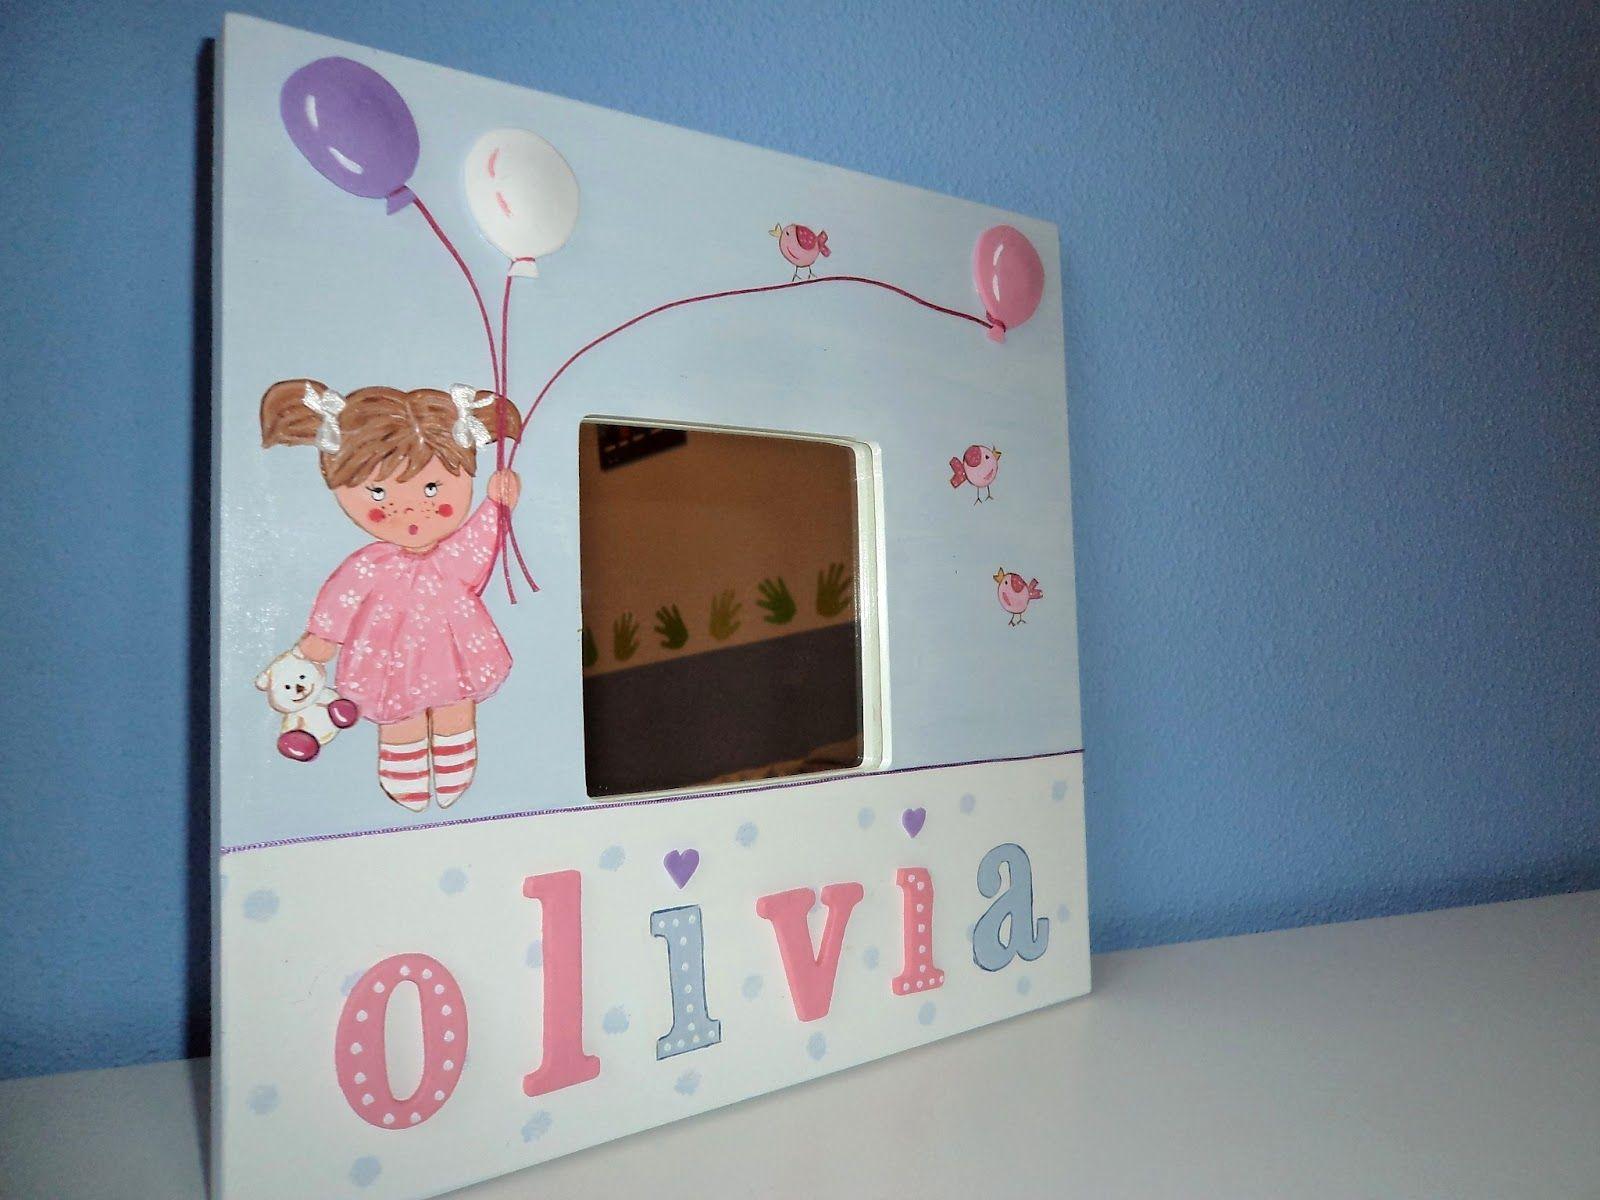 Cuadro Olivia pintado a mano | Malmas | Pinterest | Cuadro, Pintar y ...